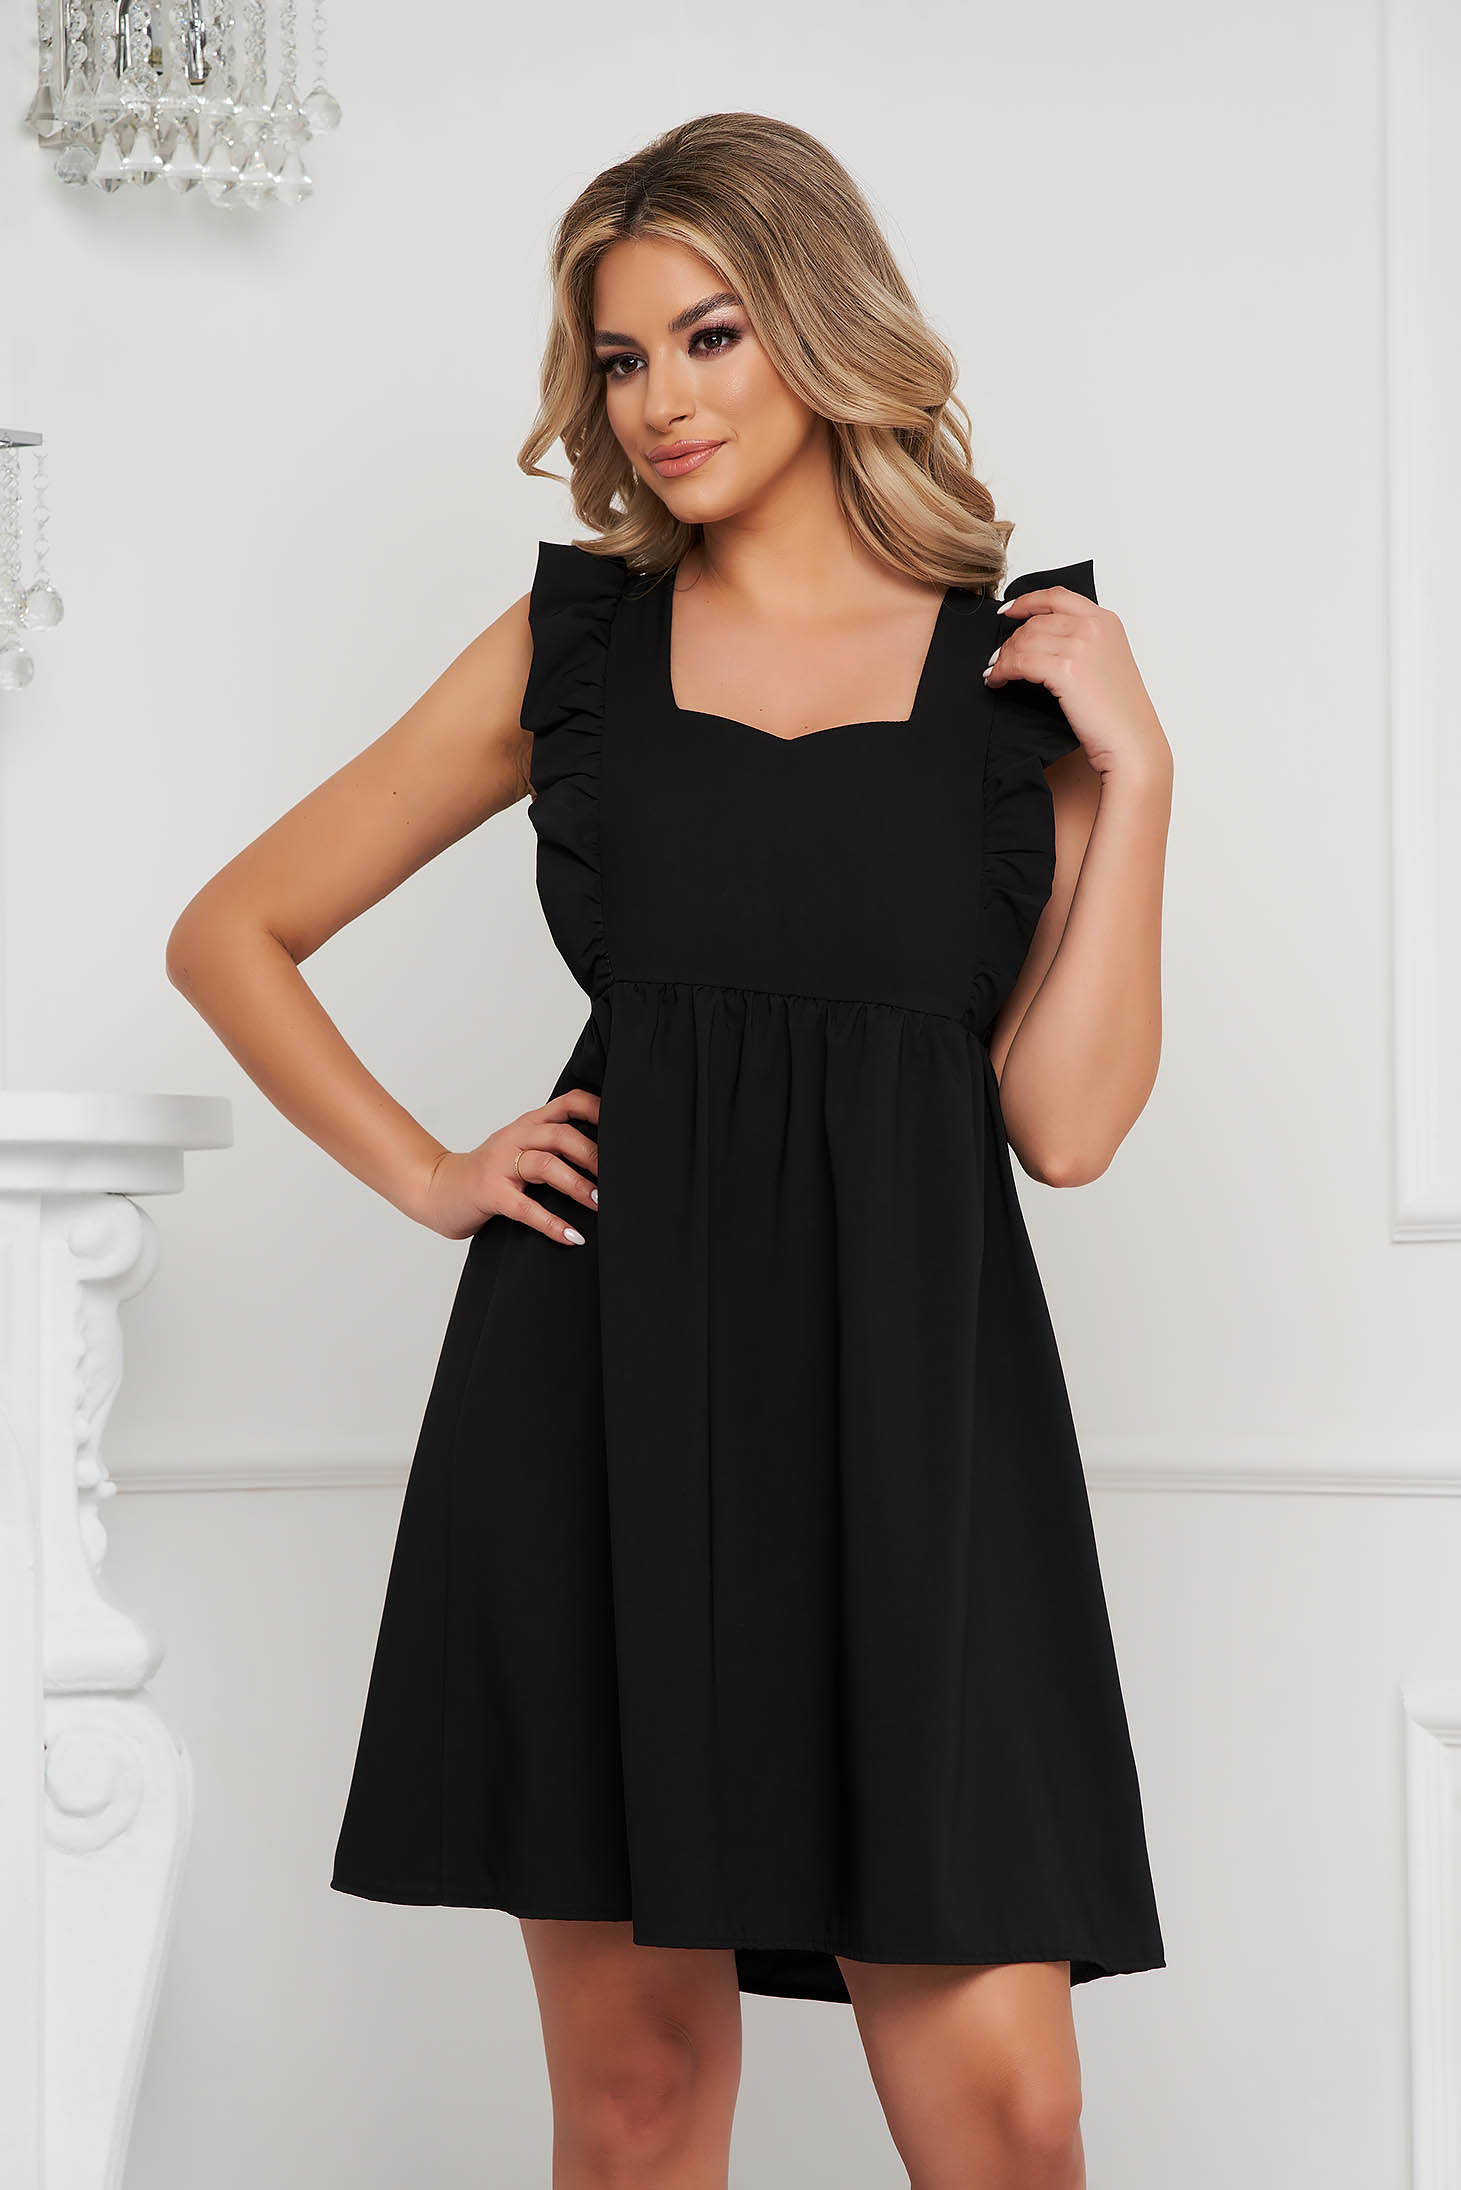 Black dress a-line with ruffle details short cut